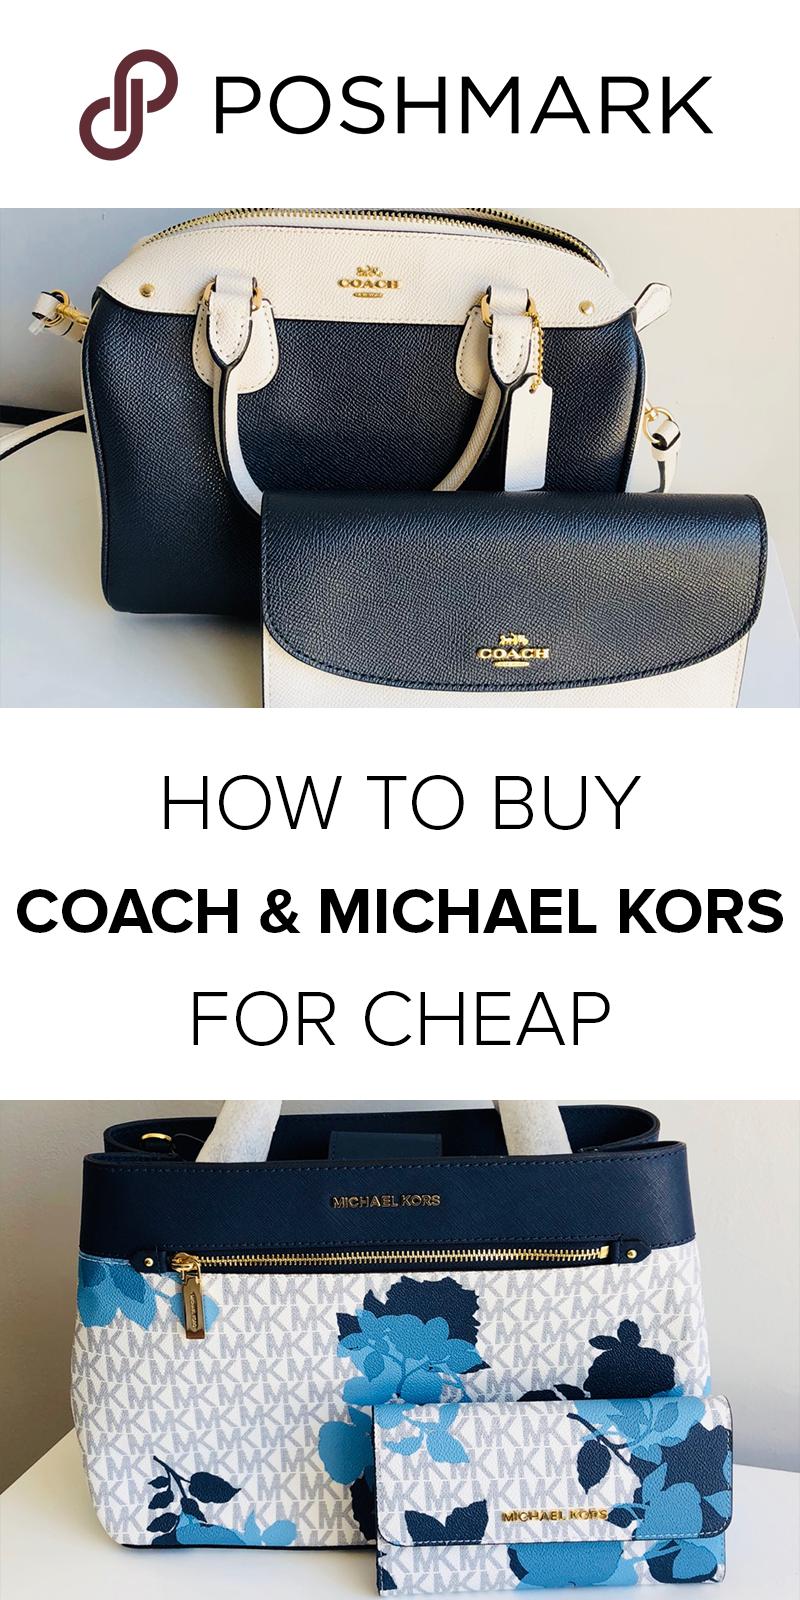 9b0b524e4e7 Get Coach   Michael Kors designer handbags for up to 70% off on Poshmark.  Download the app to shop!